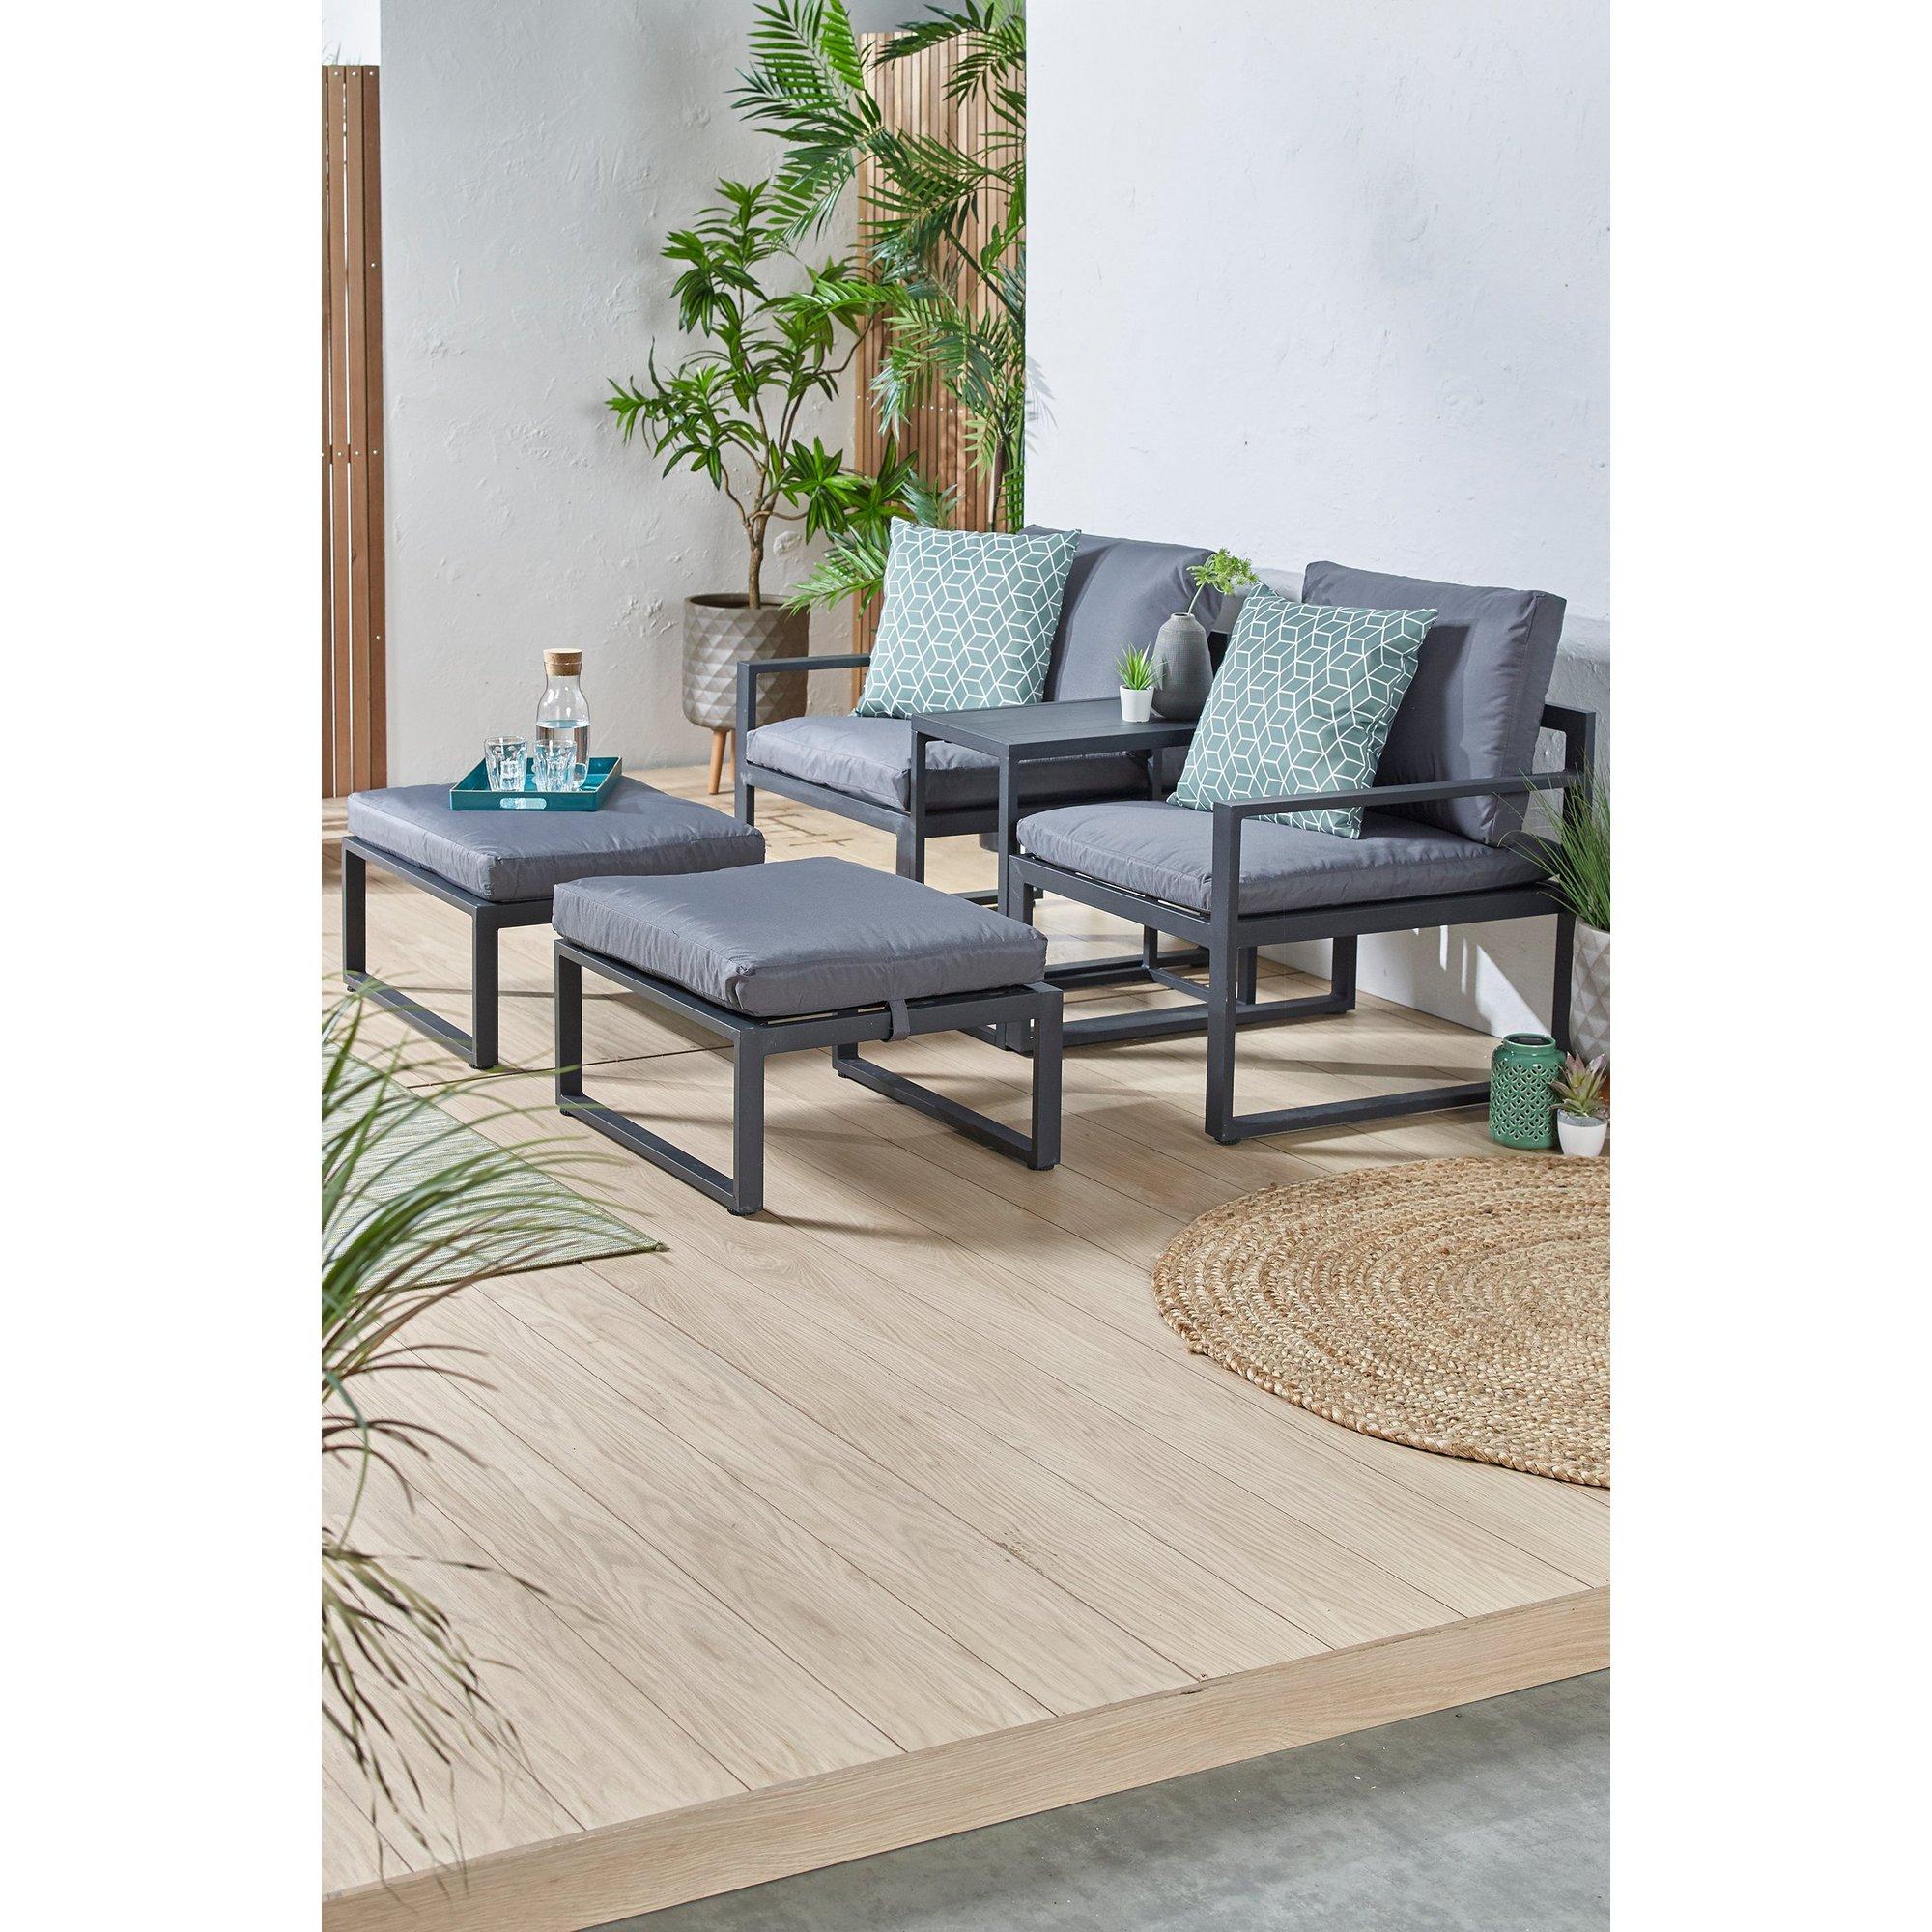 Image of Bahama Multi-Position Garden Lounge Sofa Set